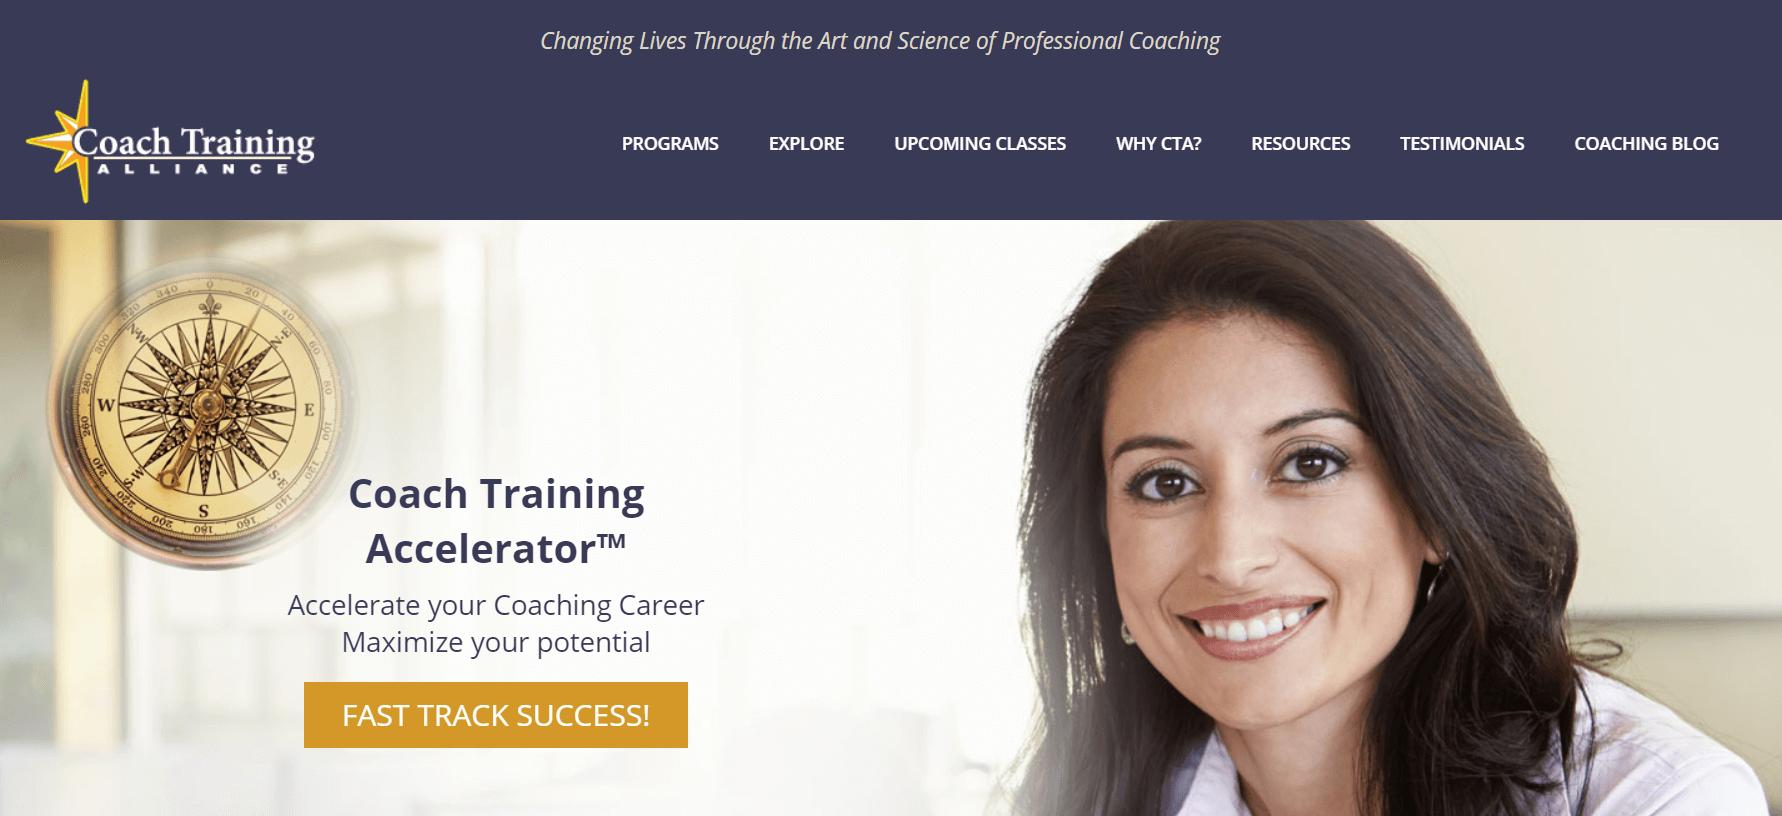 Coach-Training-Alliance-Review-Life-Coaching-Courses